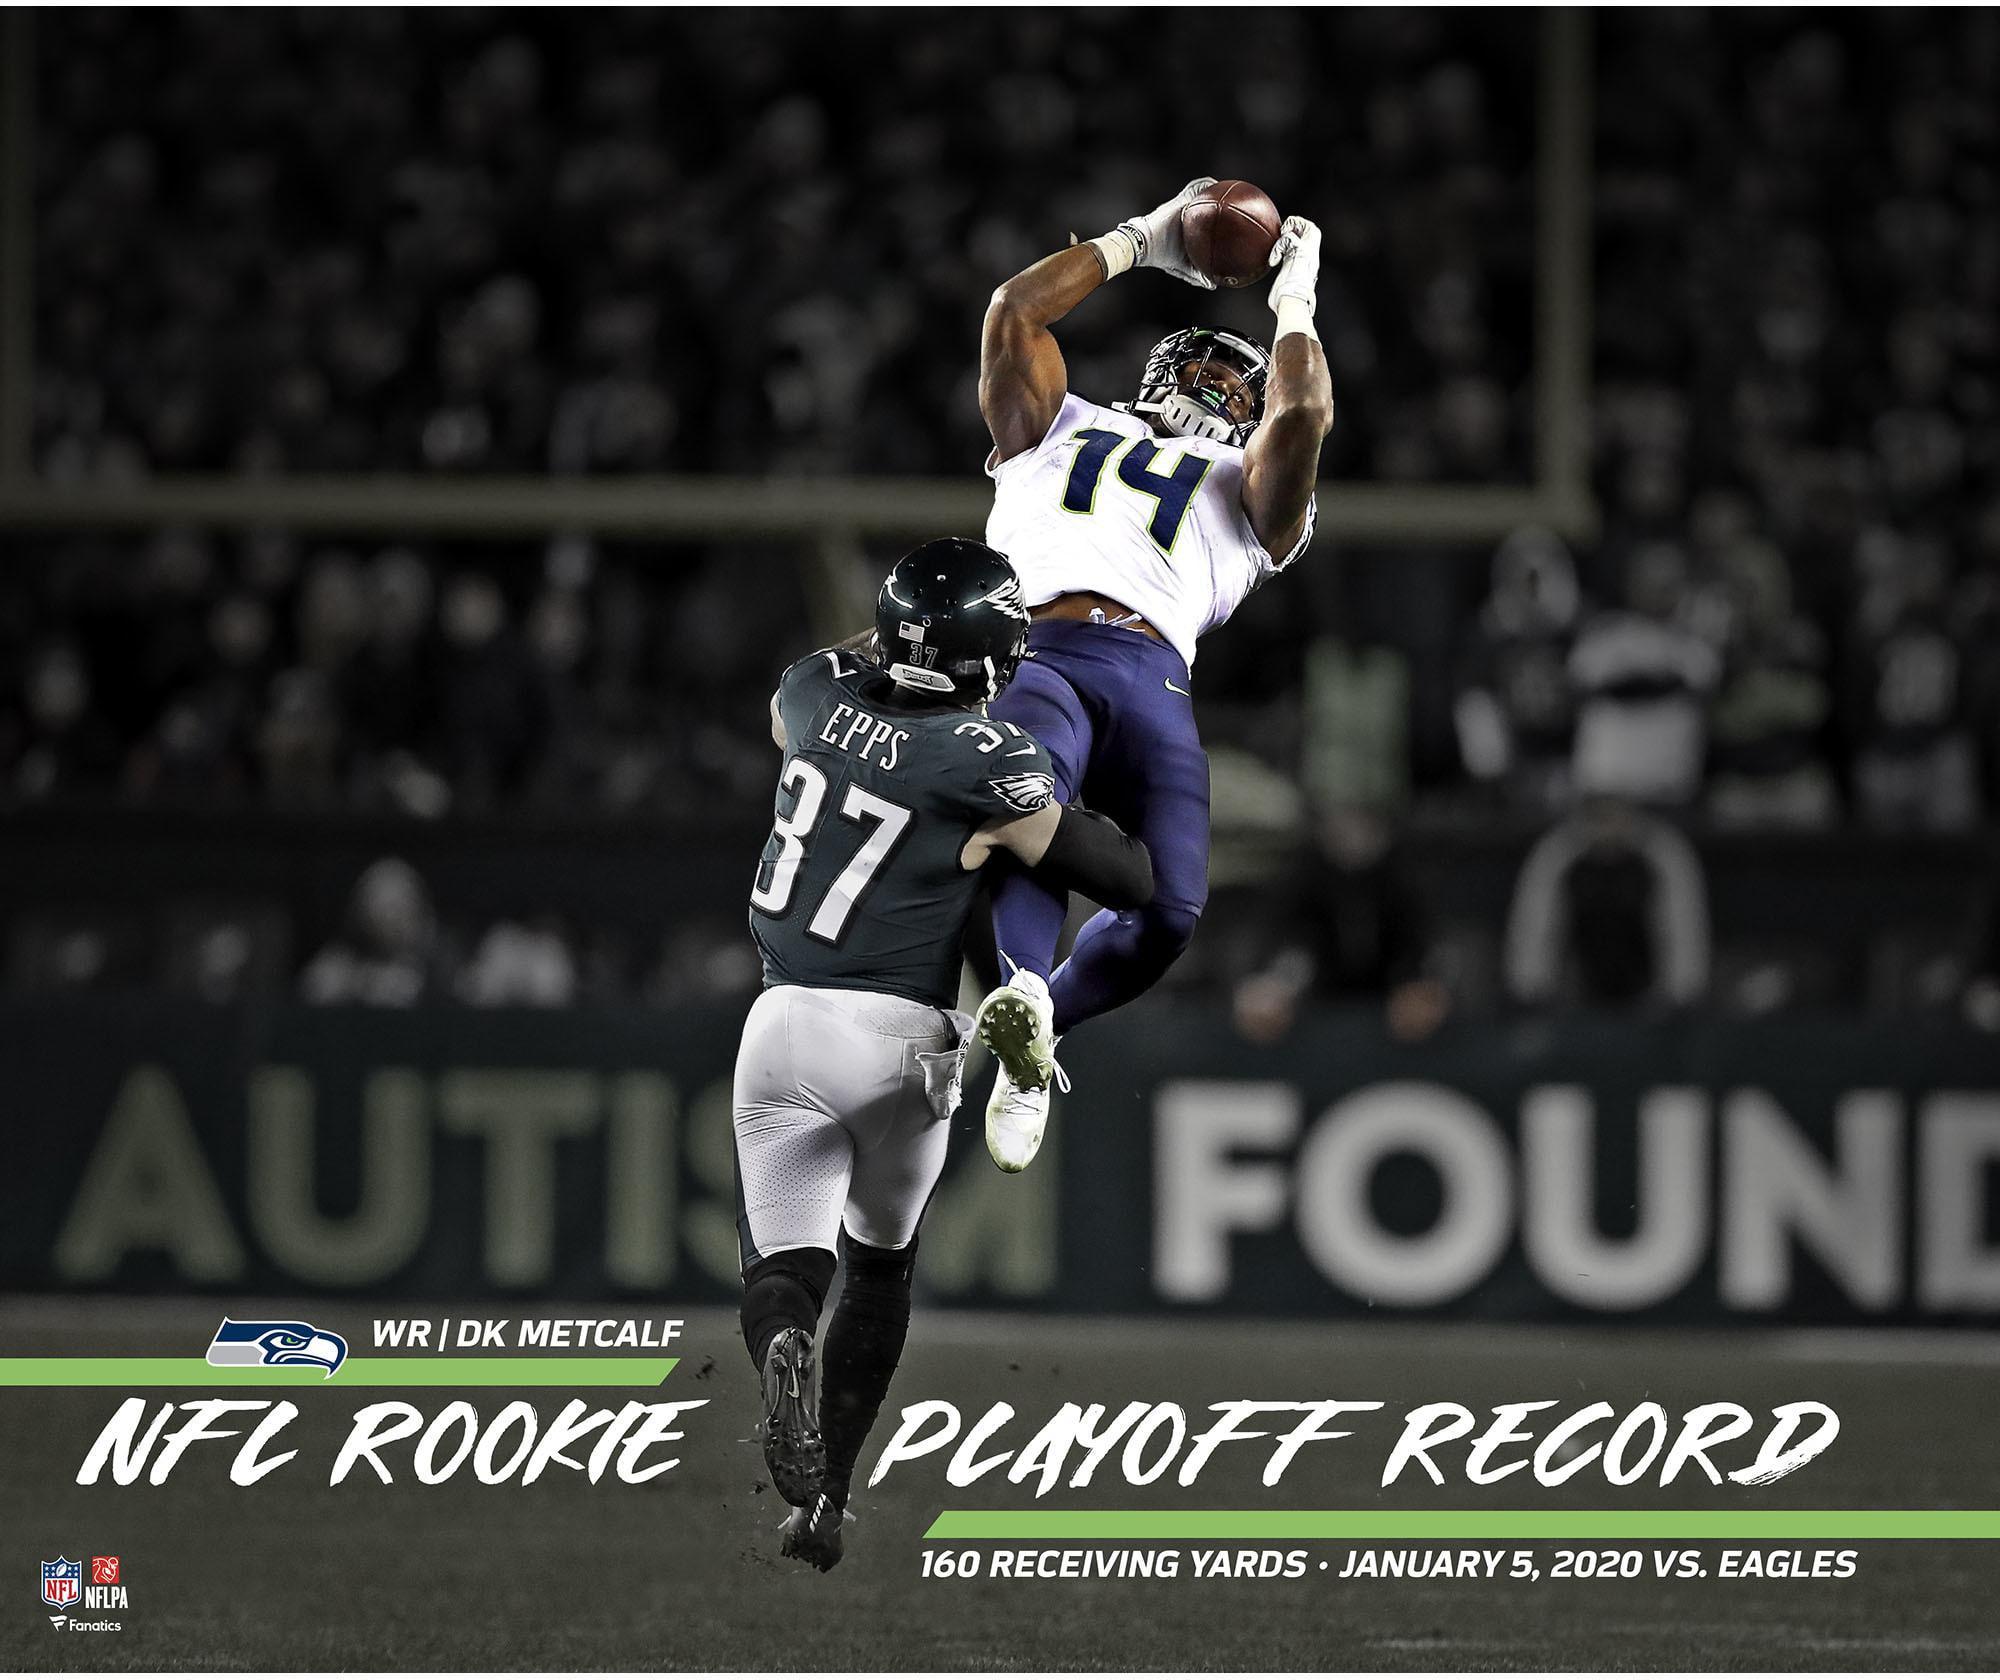 Fanatics Authentic Dk Metcalf Seattle Seahawks Unsigned Nfl Playoff Record Rookie Receiving Yards Photograph Walmart Com Walmart Com